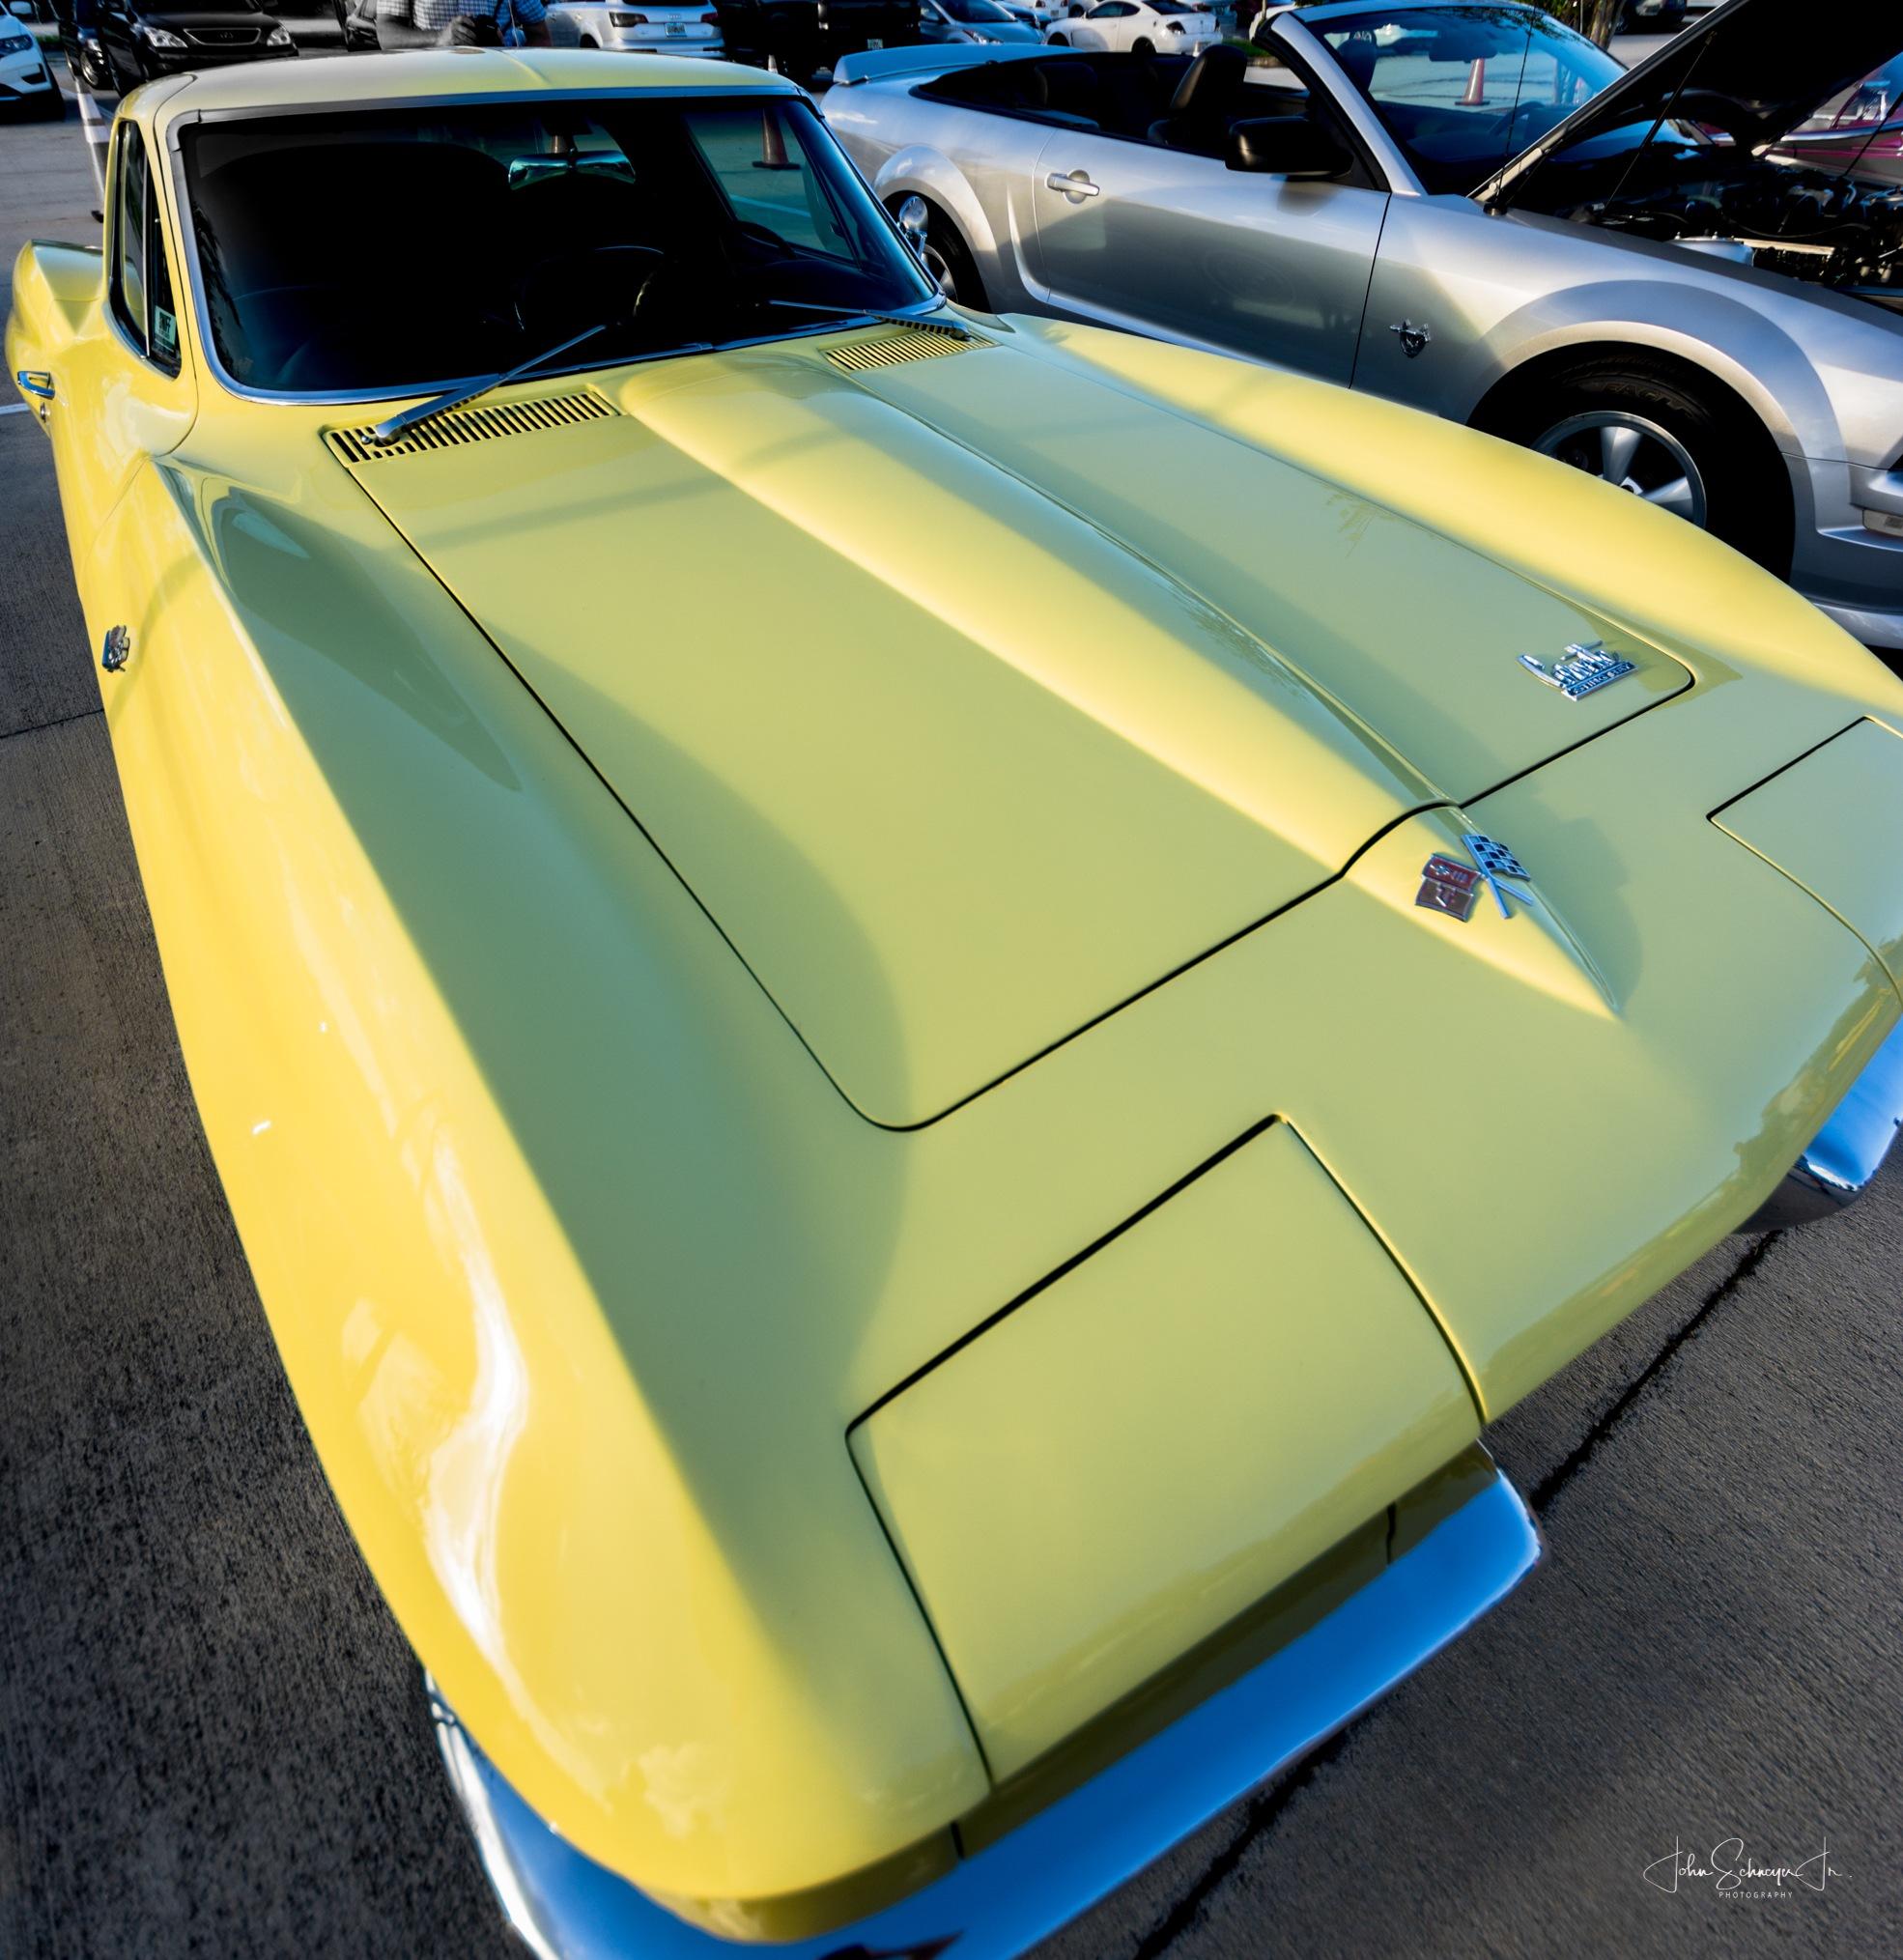 Corvette #2 by John Schneyer